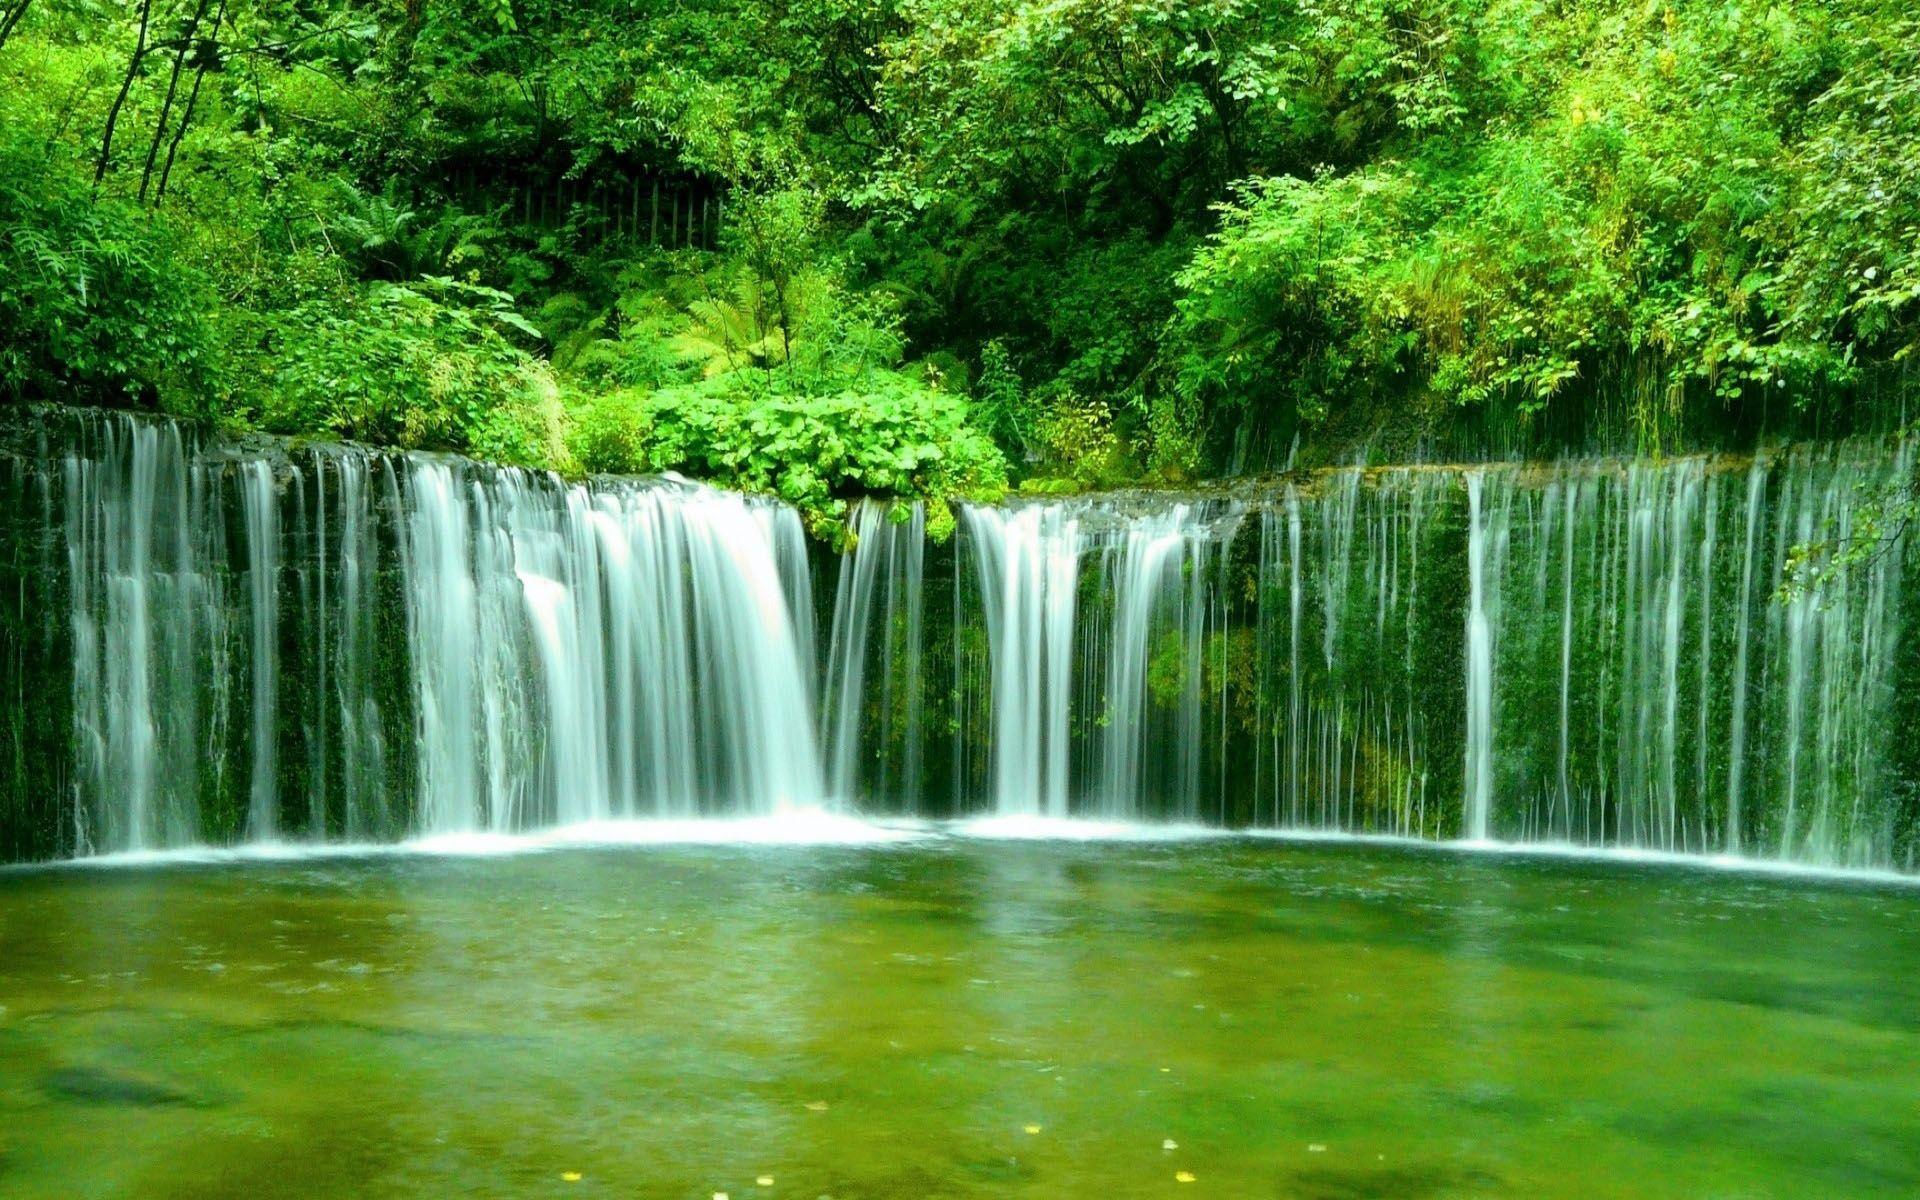 rainforest waterfalls Waterfall In Forest Fond ecran